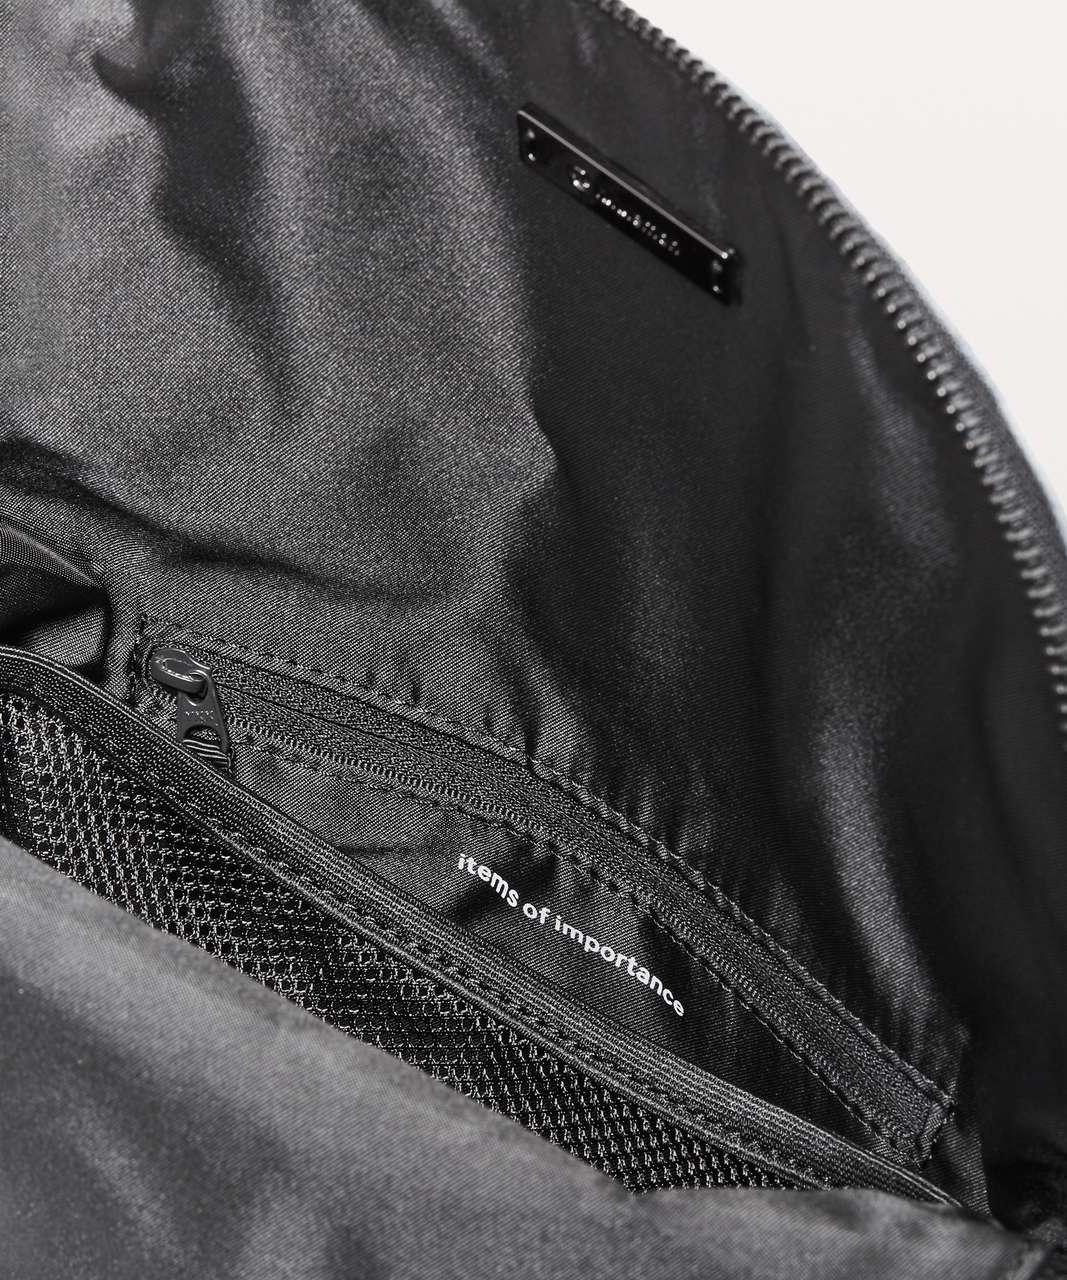 Lululemon Festival Bag II *5L - Spray Dye Grey Multi / Black